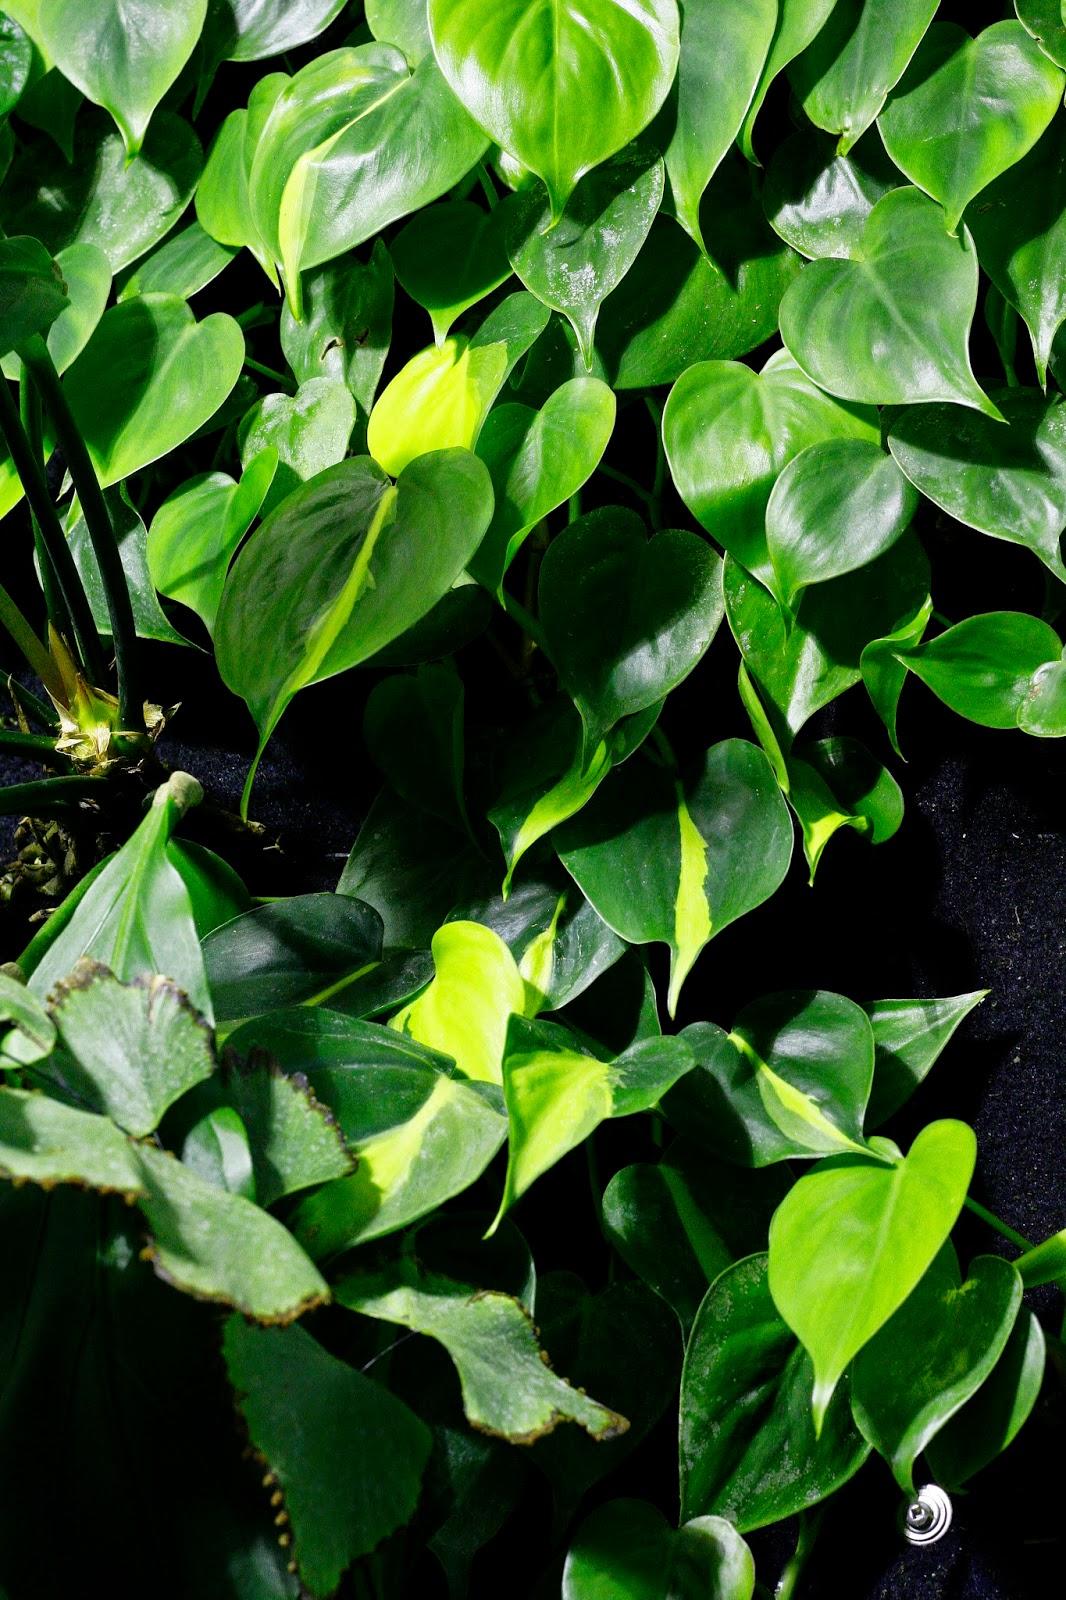 plants, vertical garden, toronto,  interior landscape, interiorscape, office, professional, maintenance, in situ, biophilia,  indoor, plant, garden, terrarium, Philodendron, hederaceum